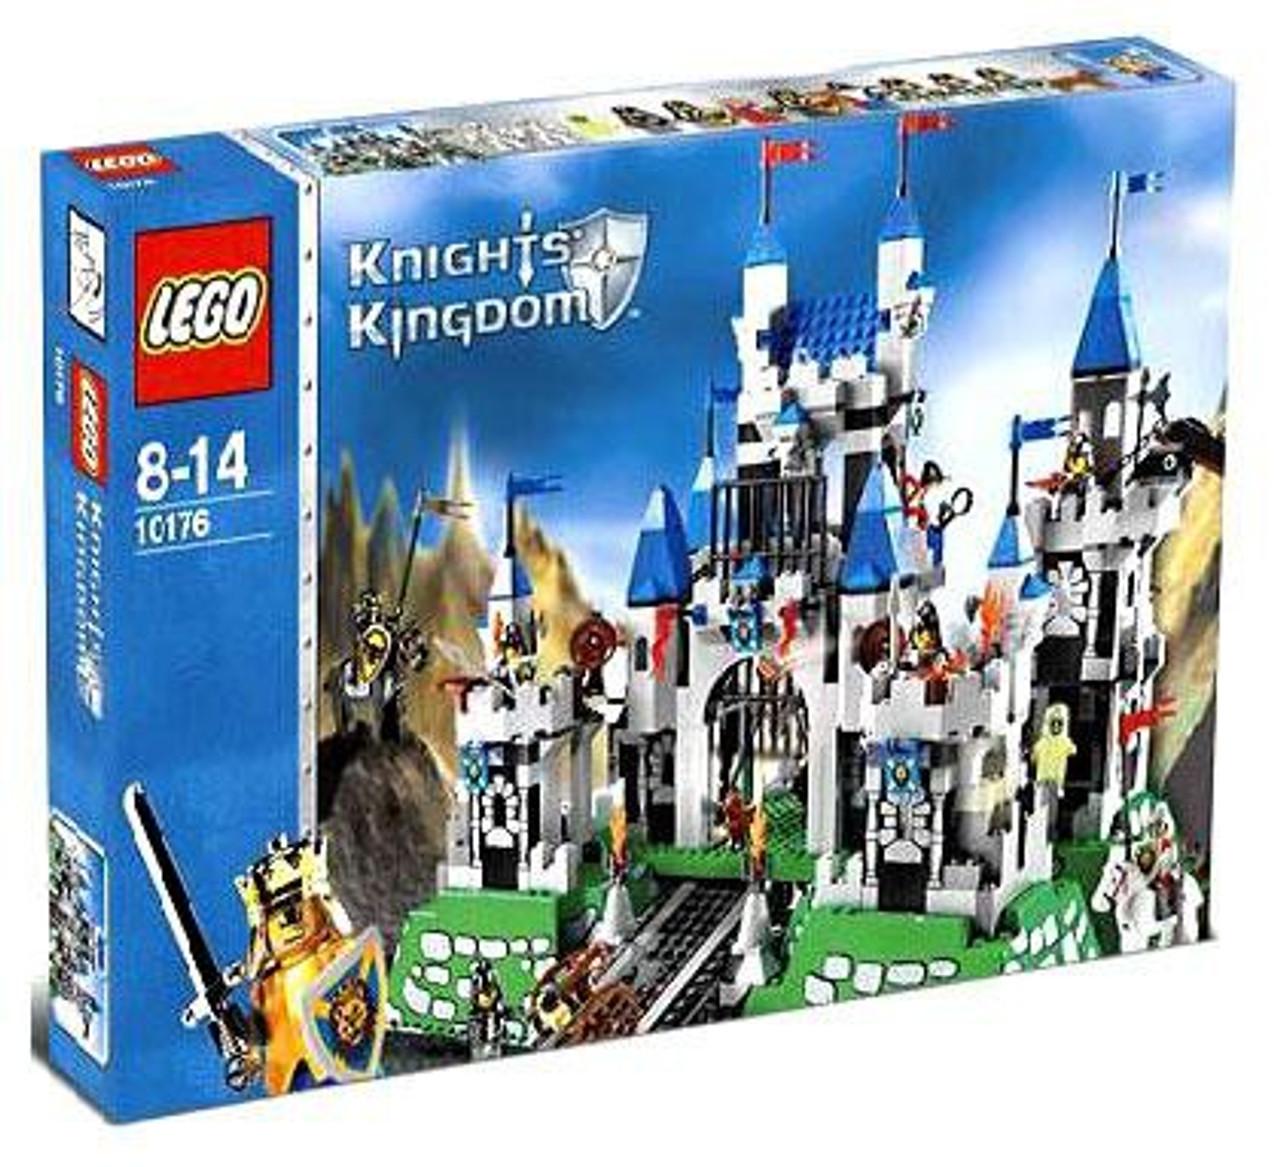 Lego Kingdom Knights LEGO Bau- & Konstruktionsspielzeug Baukästen & Konstruktion